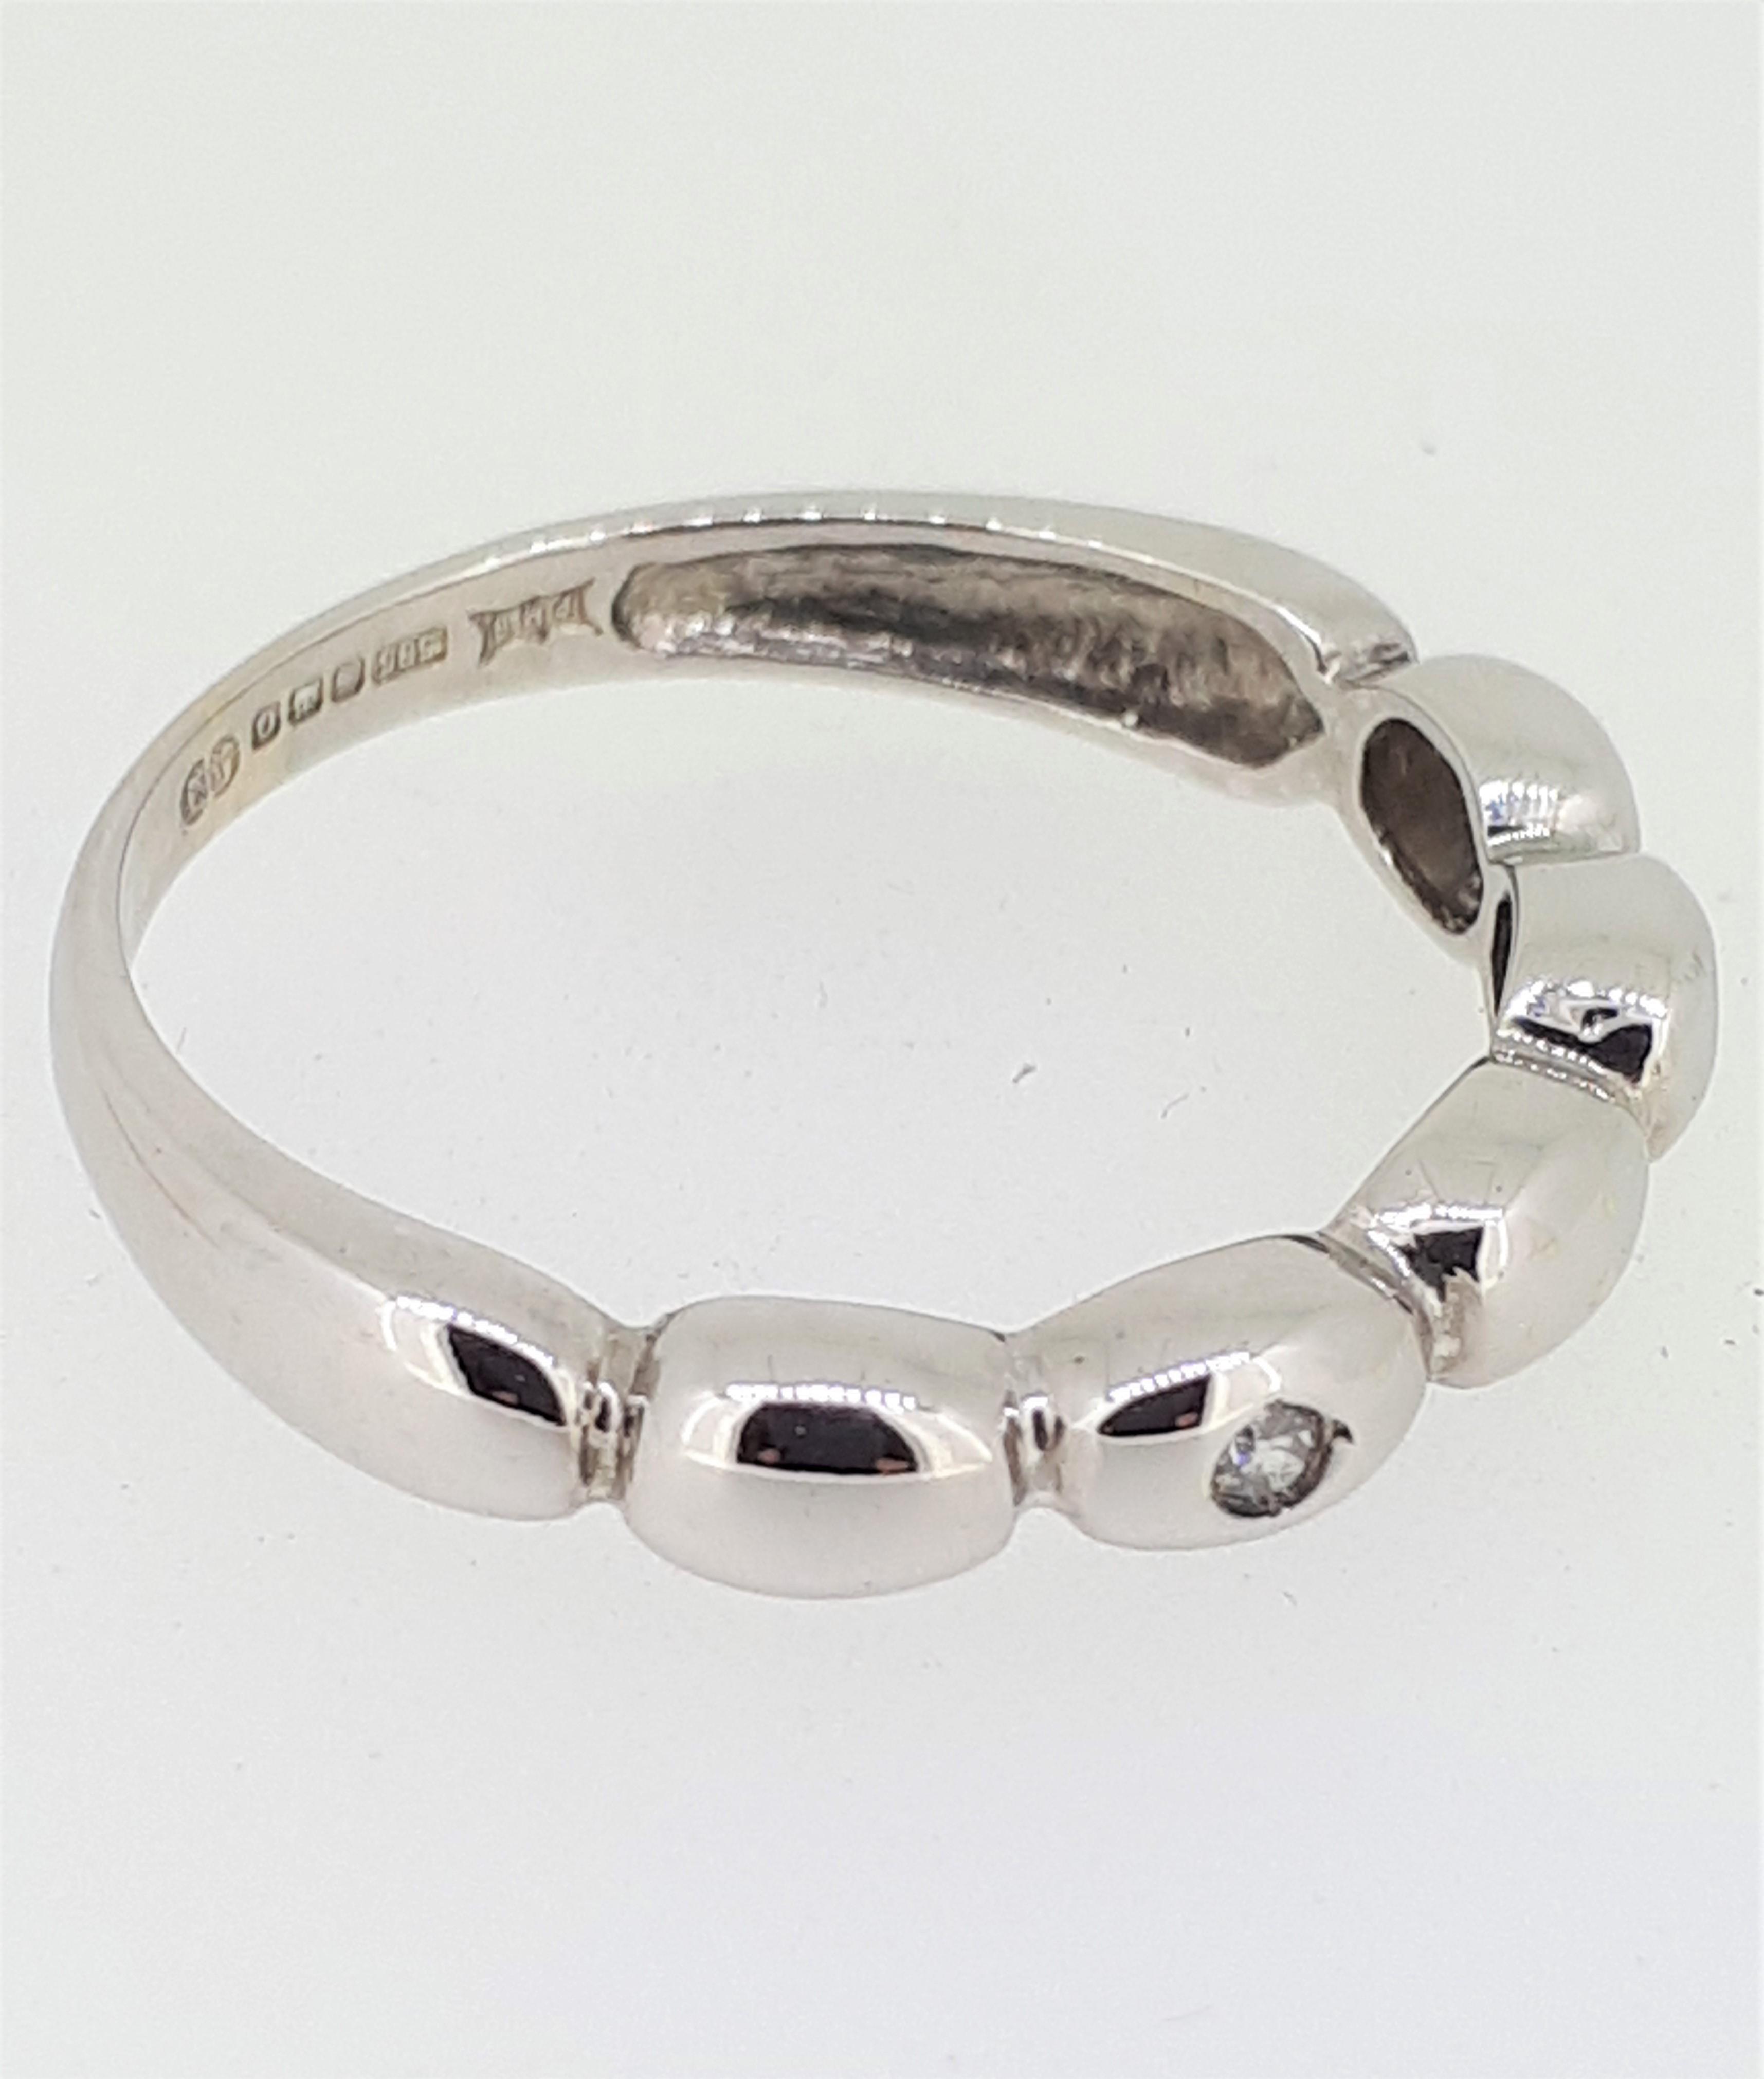 14ct (585) White Gold & Diamond Five Bead Ring - Image 5 of 6